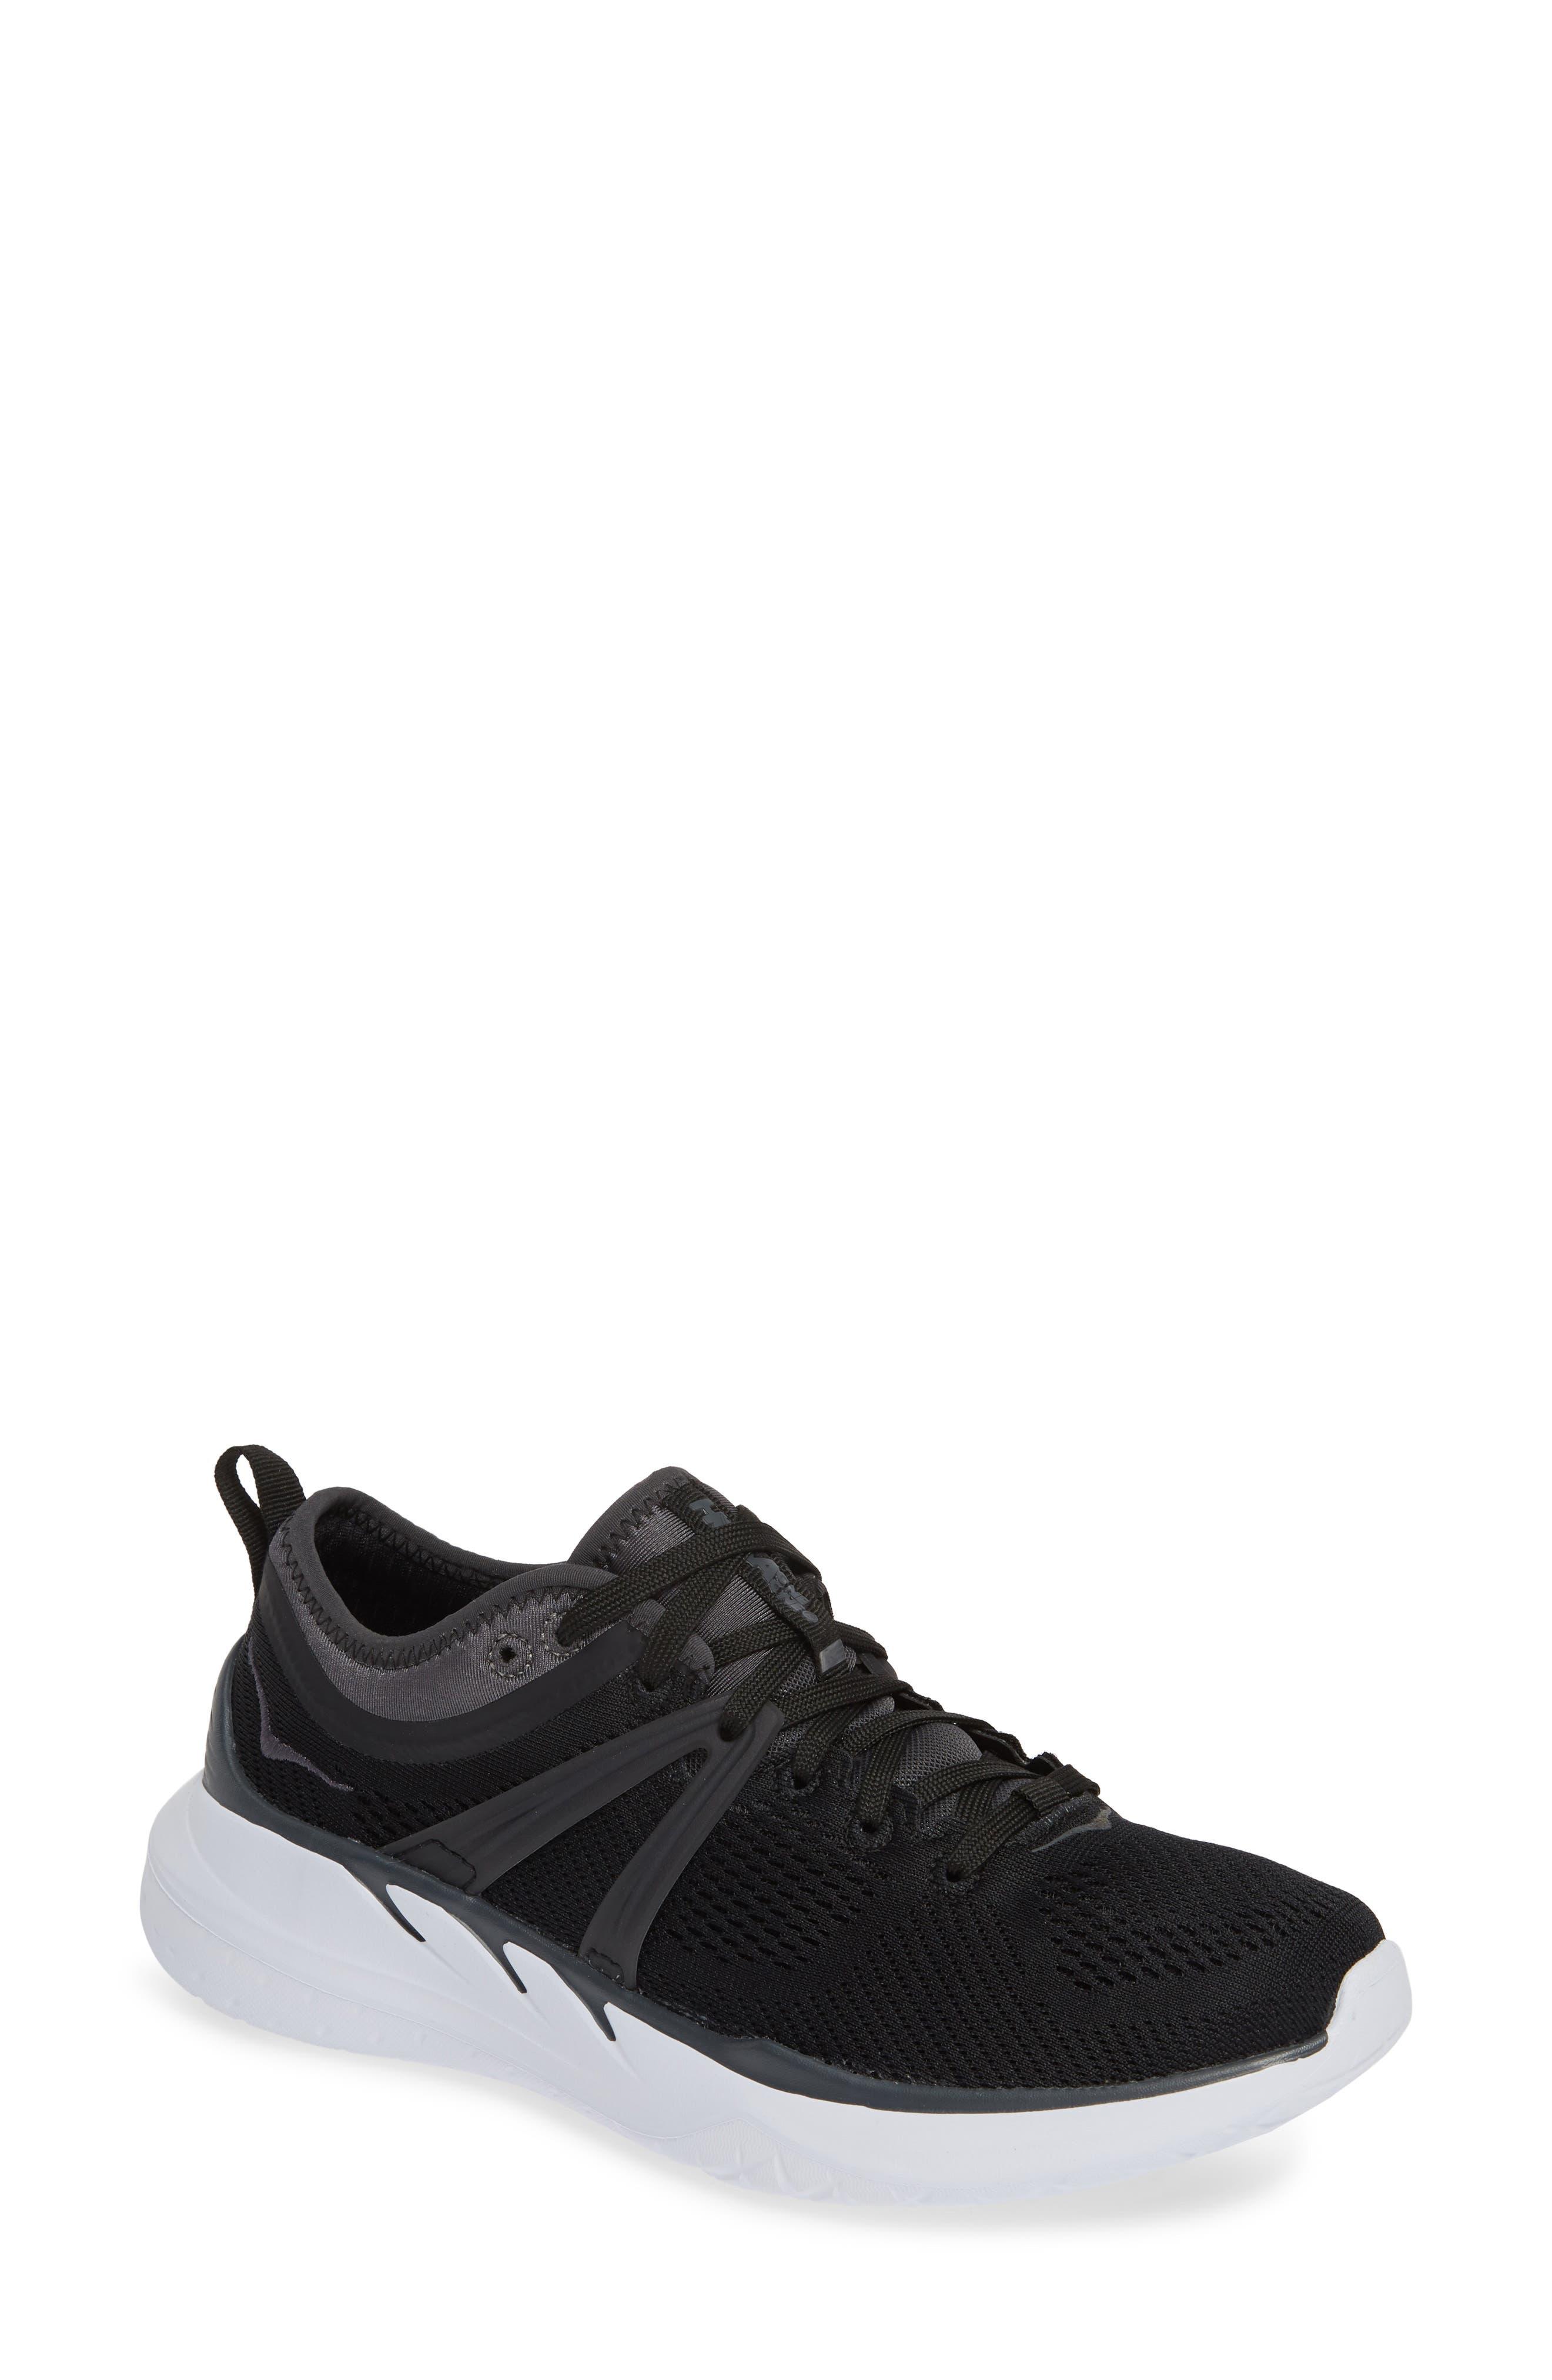 Hoka One One Tivra Running Shoe, Black